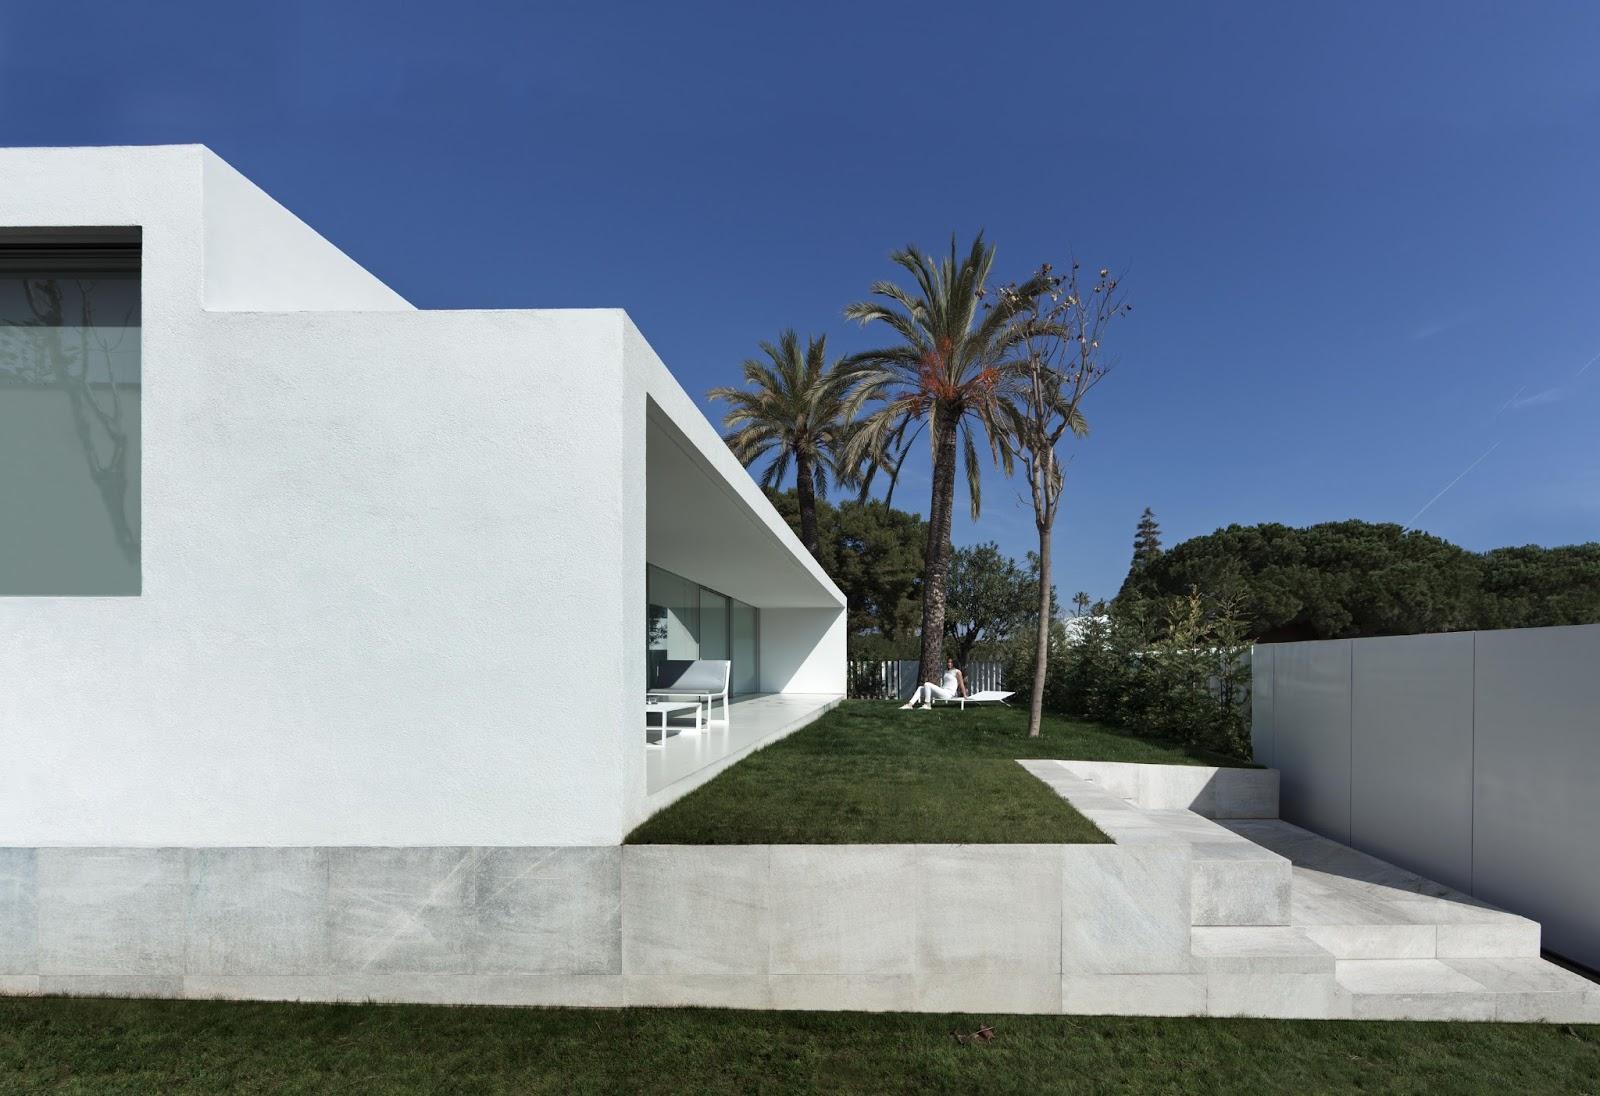 Simplicity love breeze house spain fran silvestre - Fran silvestre arquitectos ...